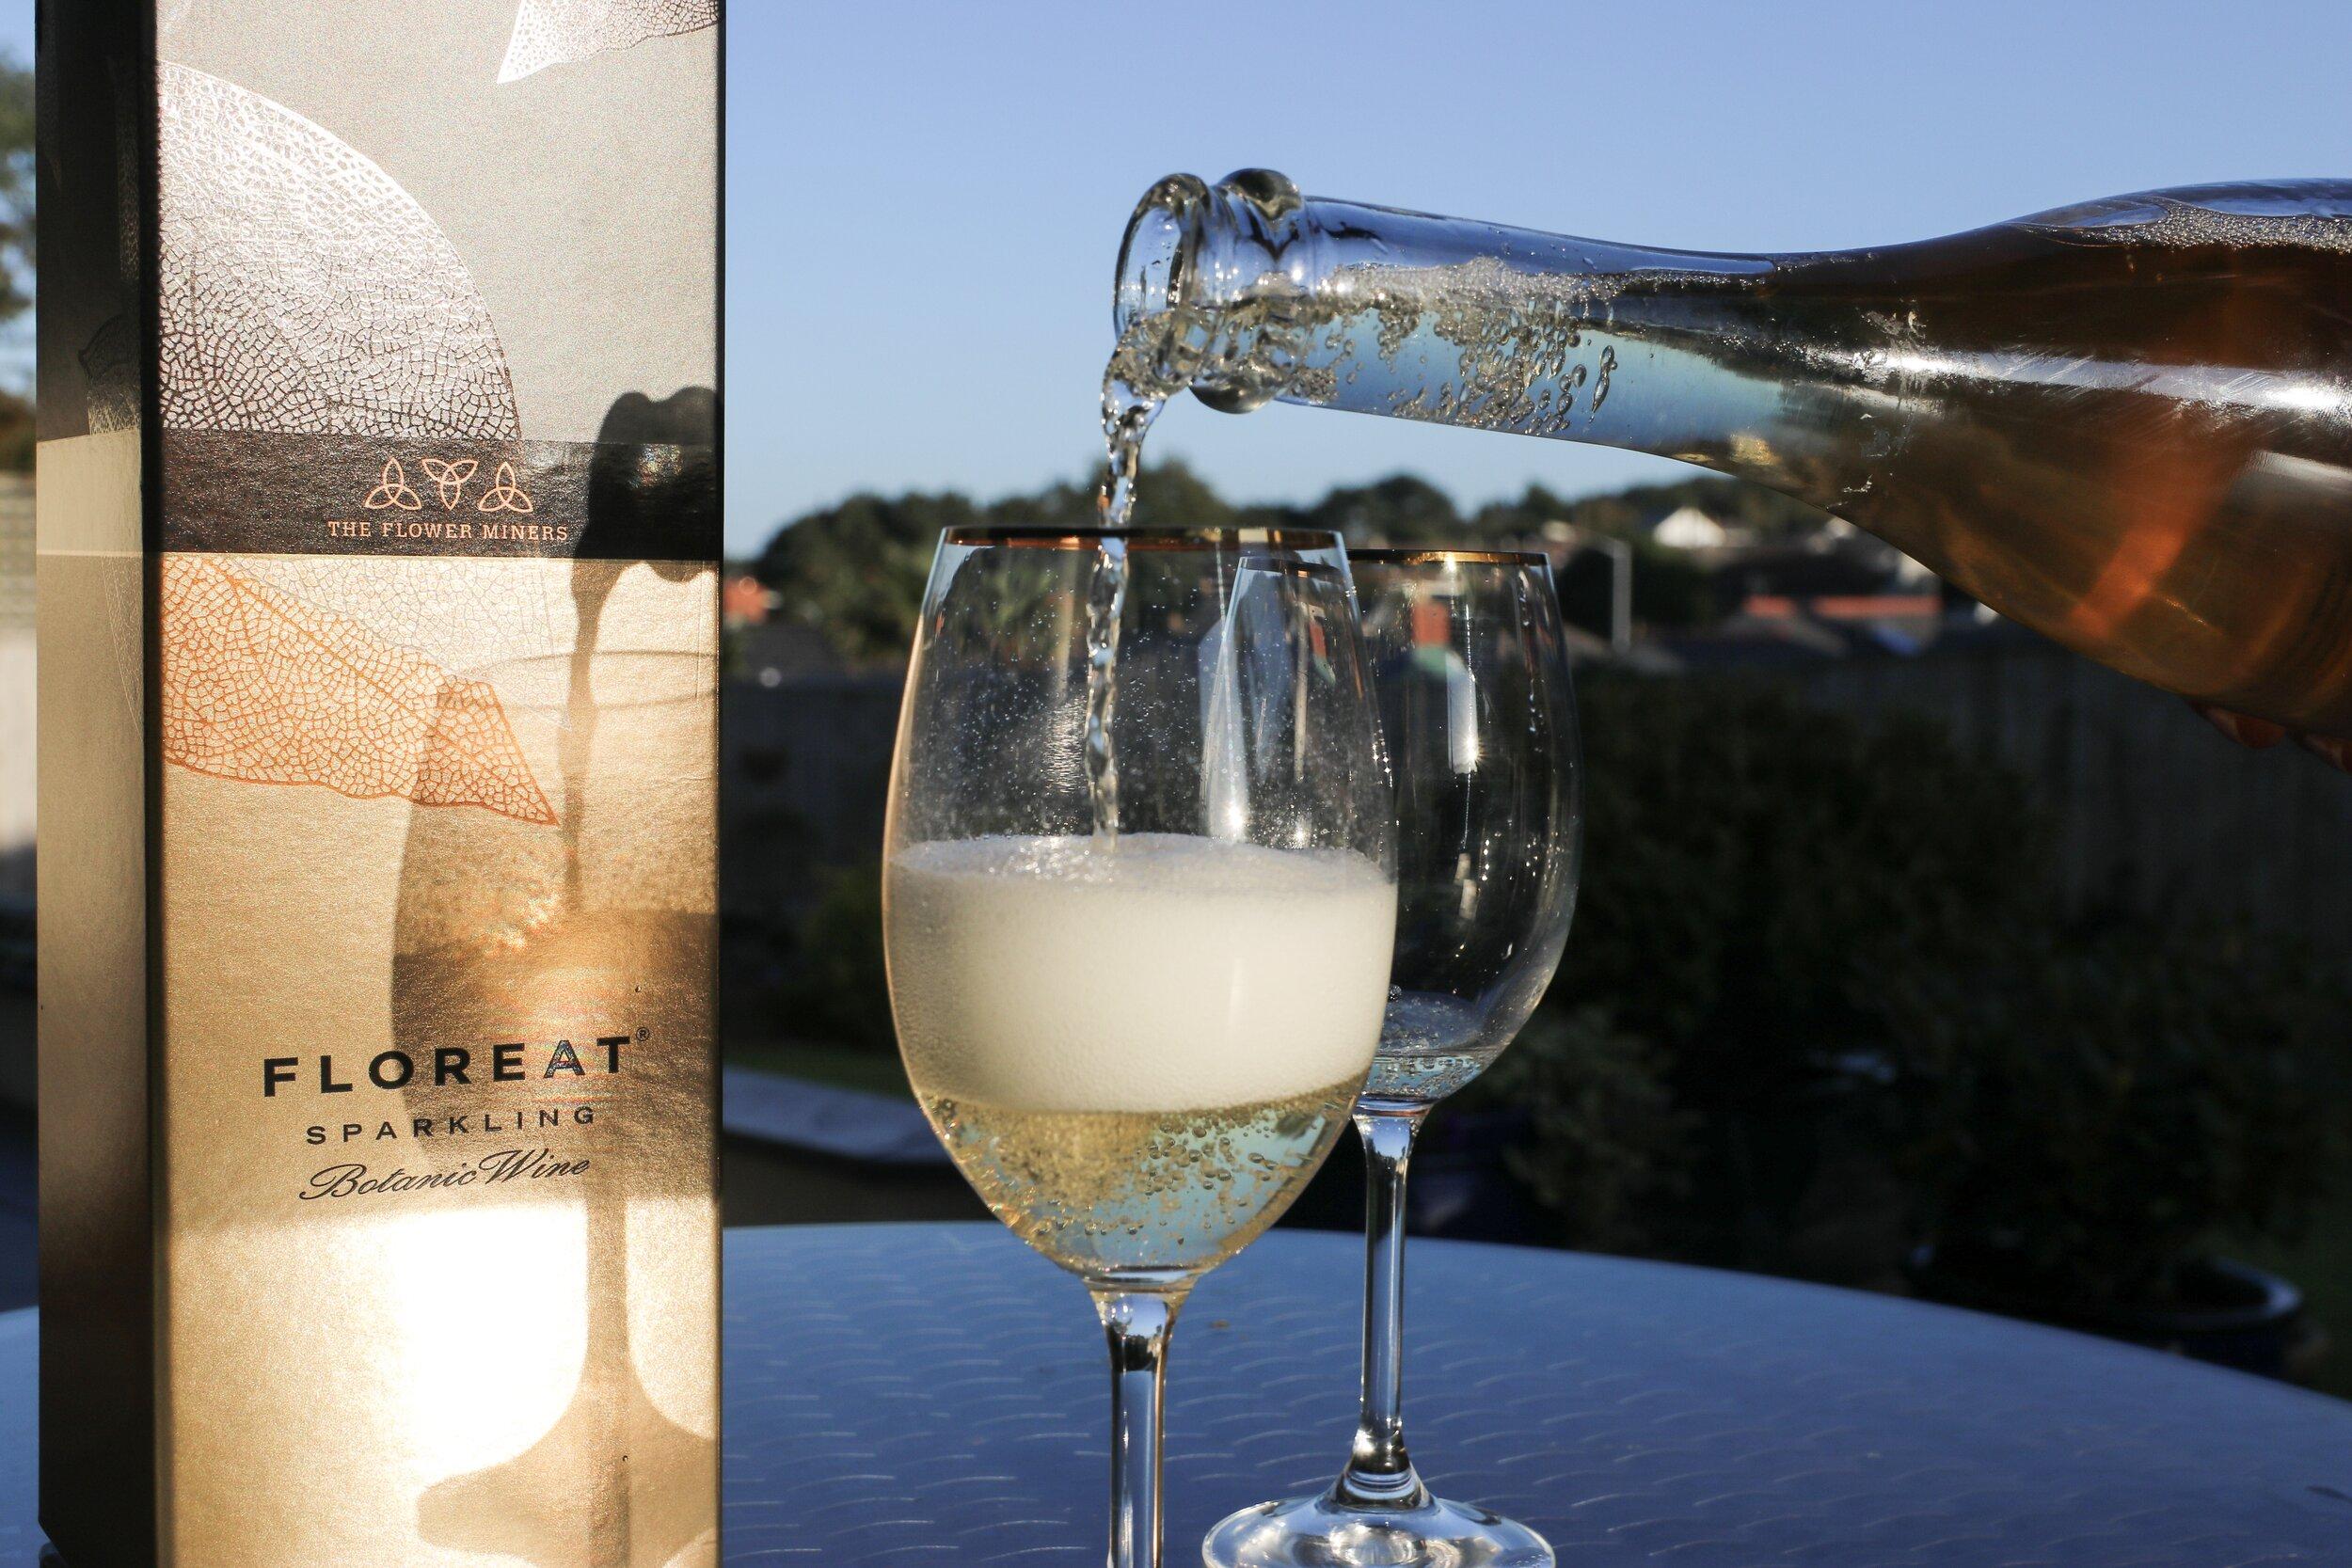 Sparkling Wine Floreat